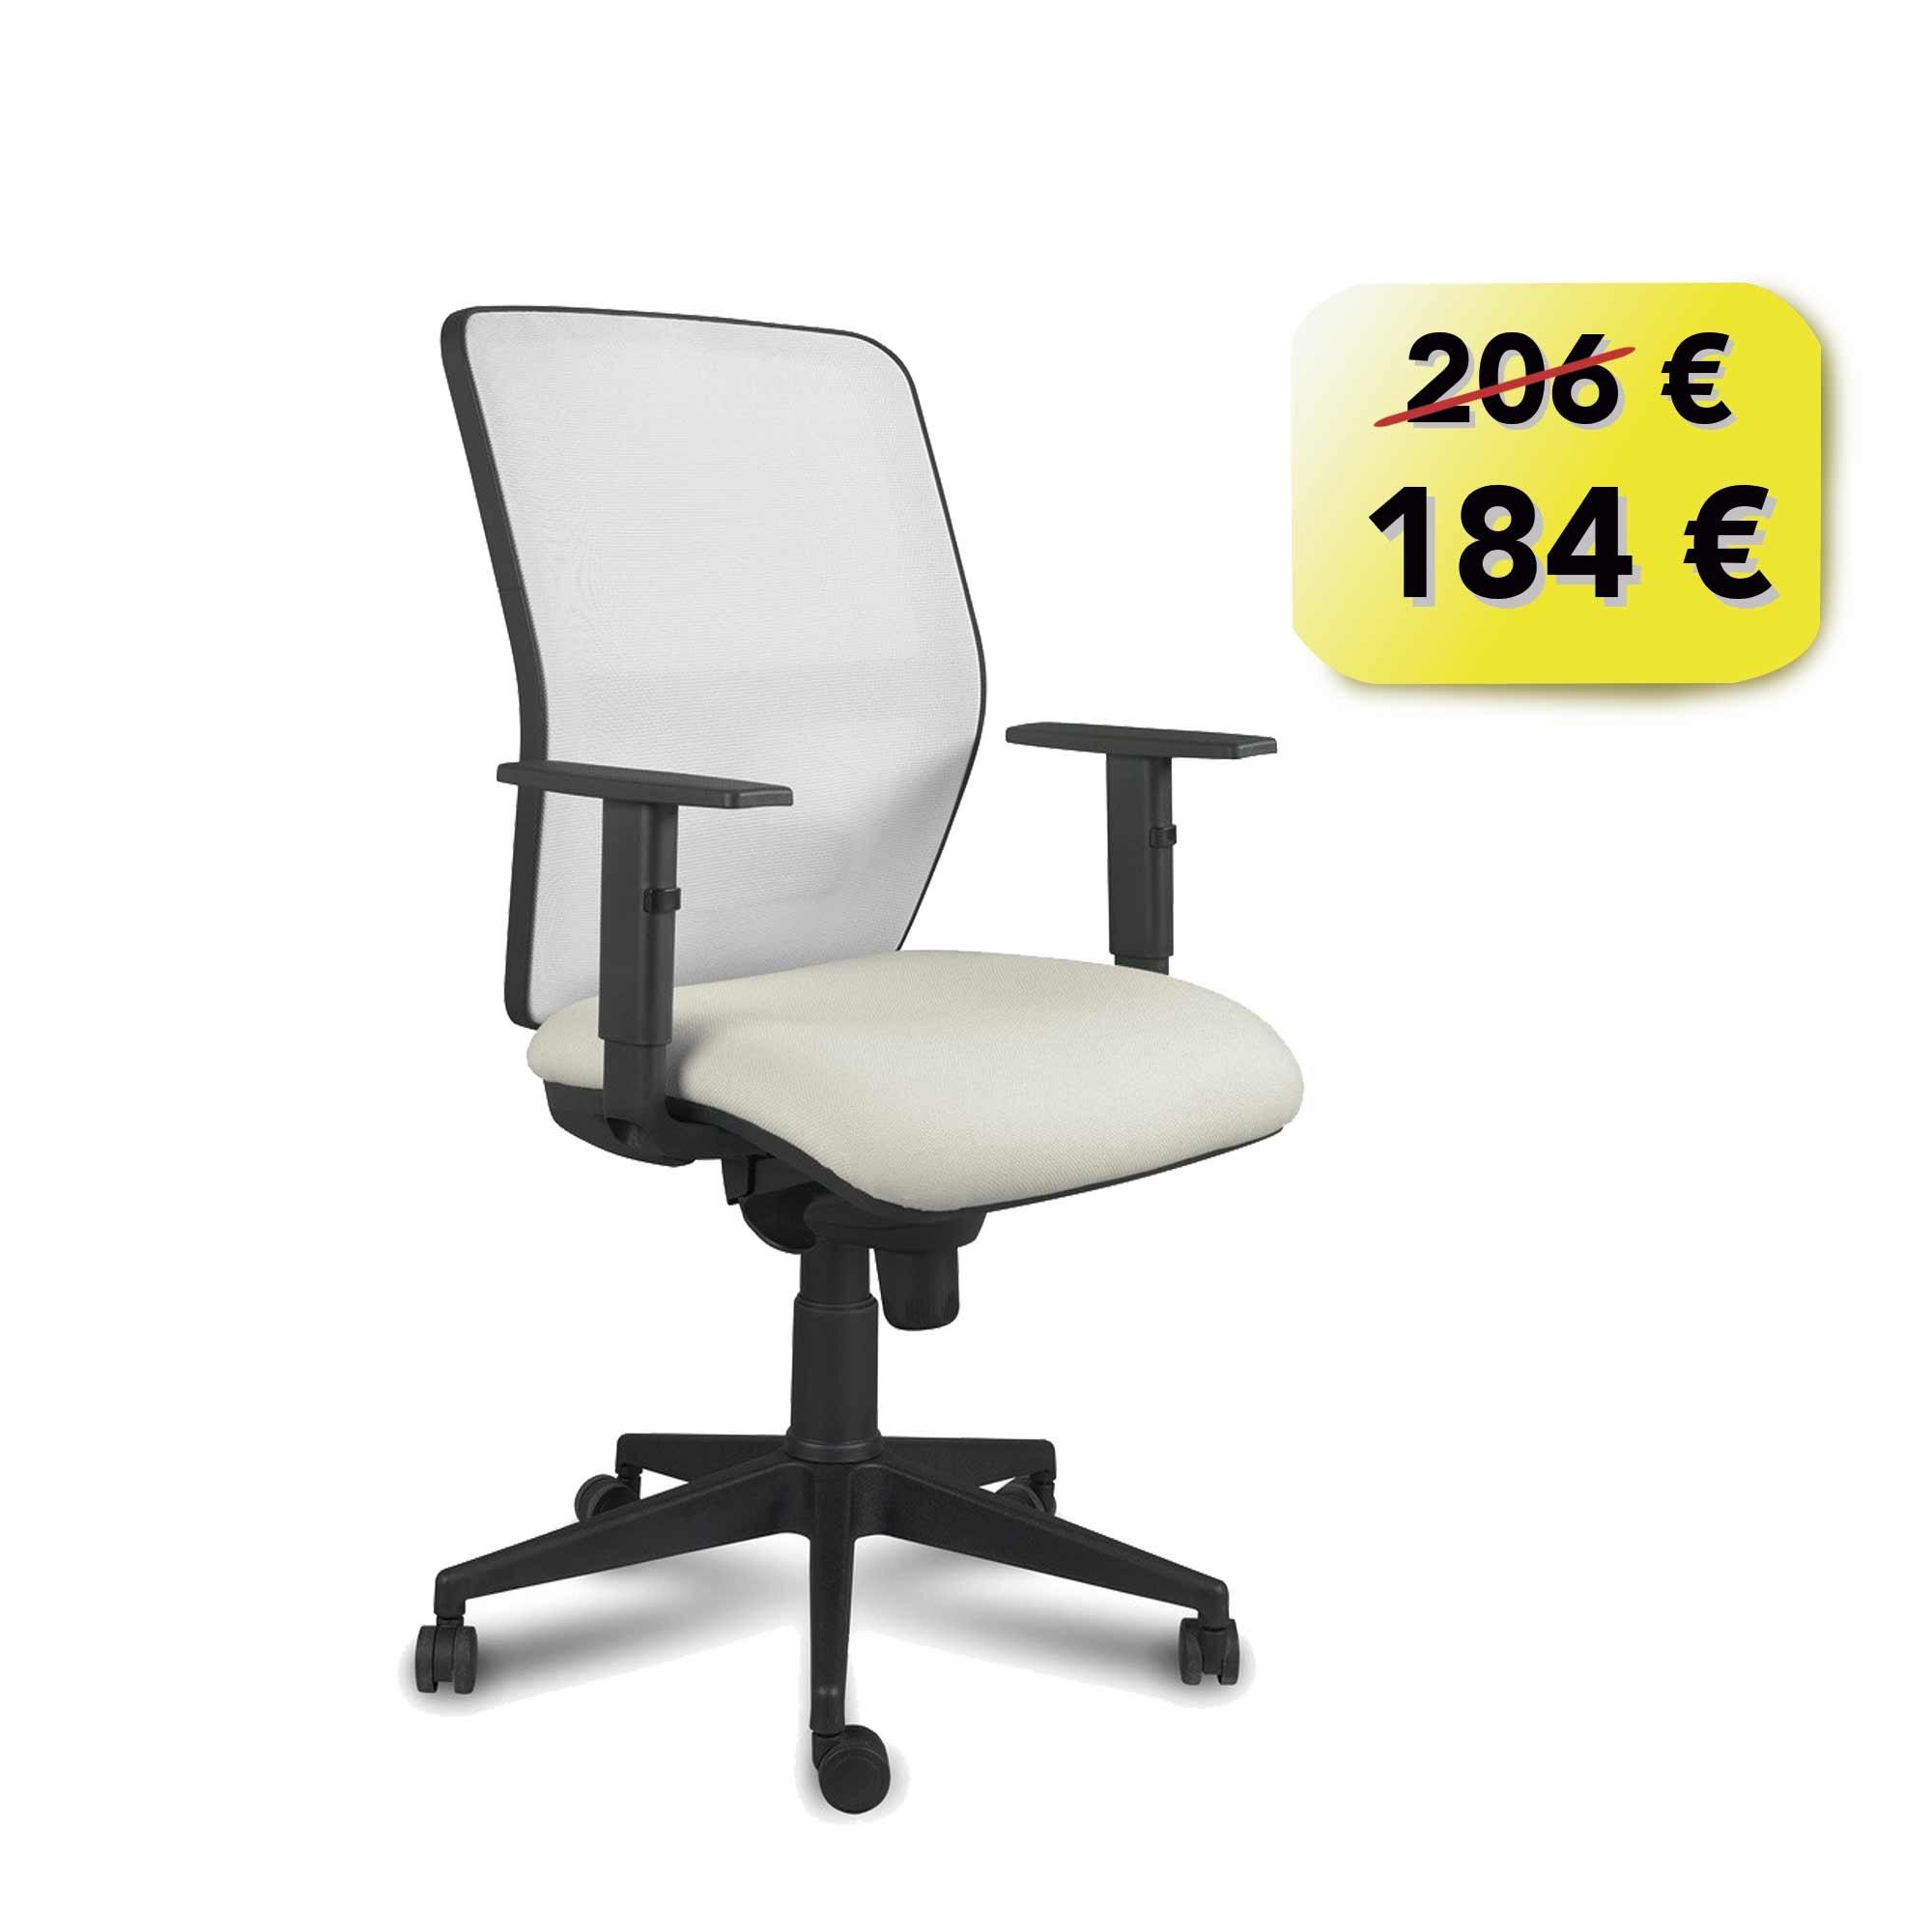 silla de oficina KERRY